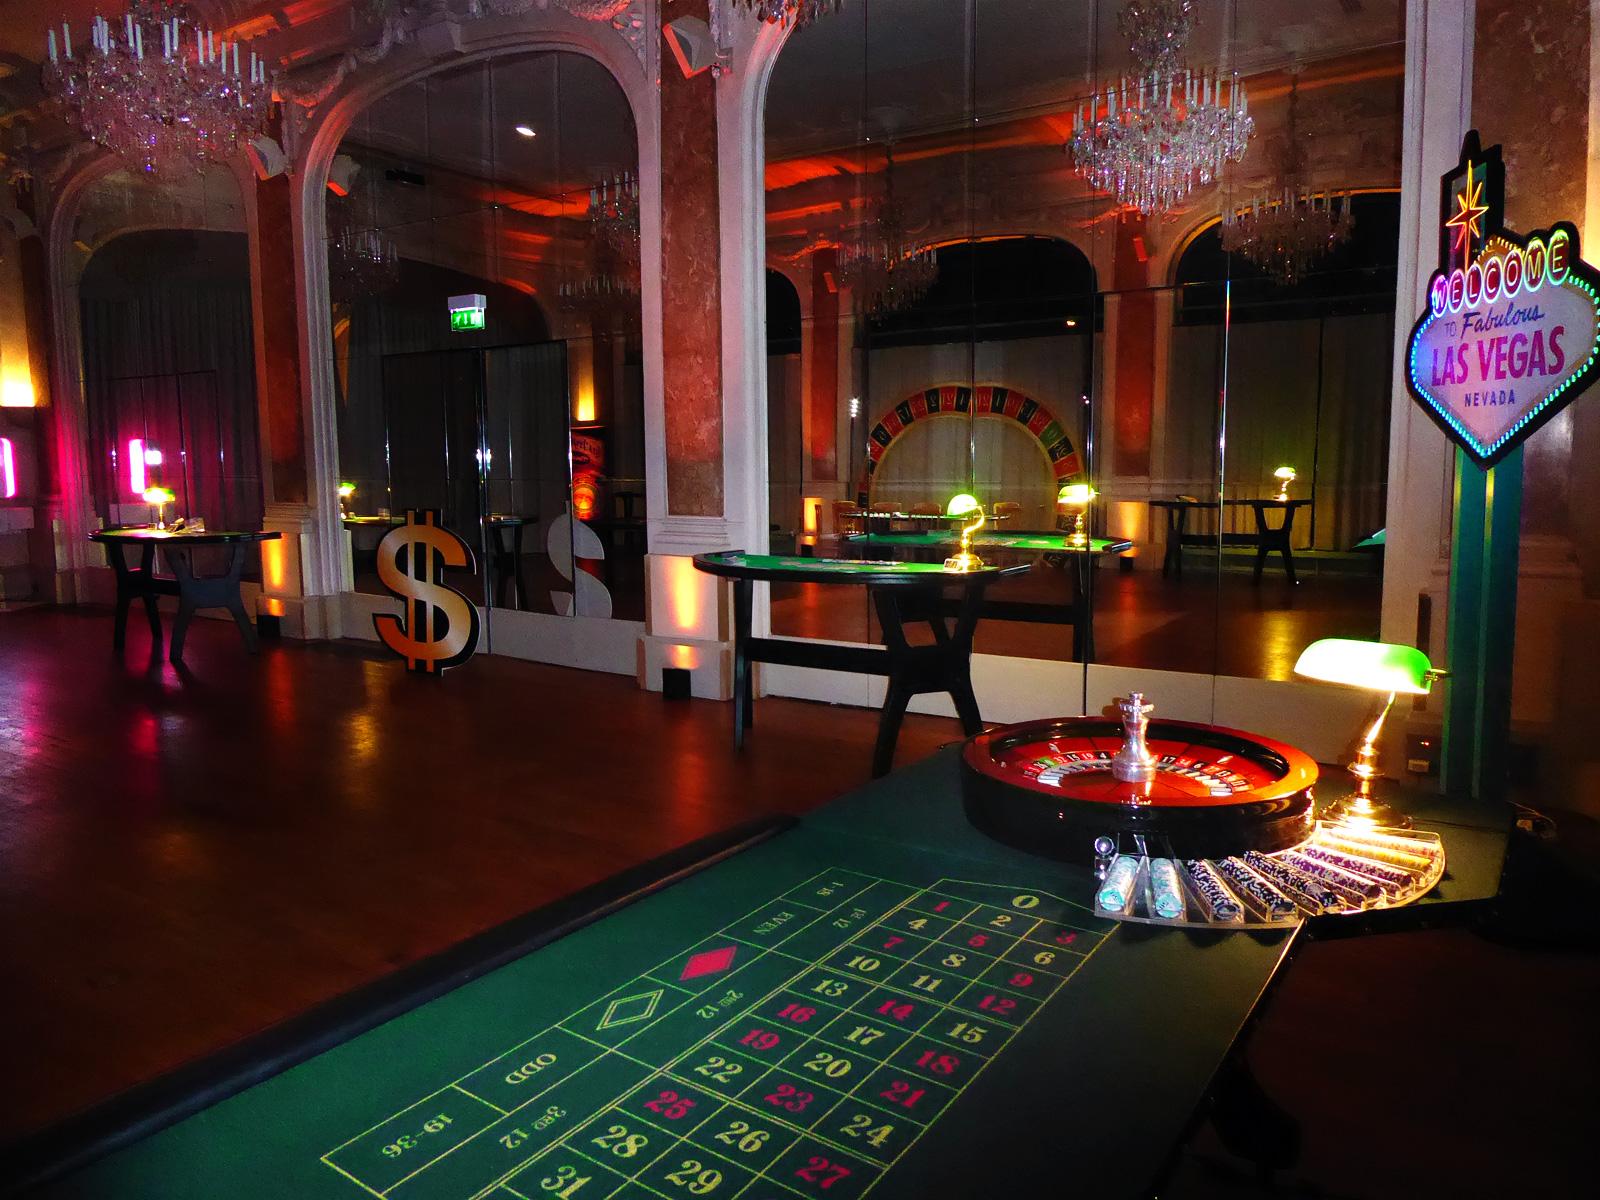 Decors-Las-Vegas casino